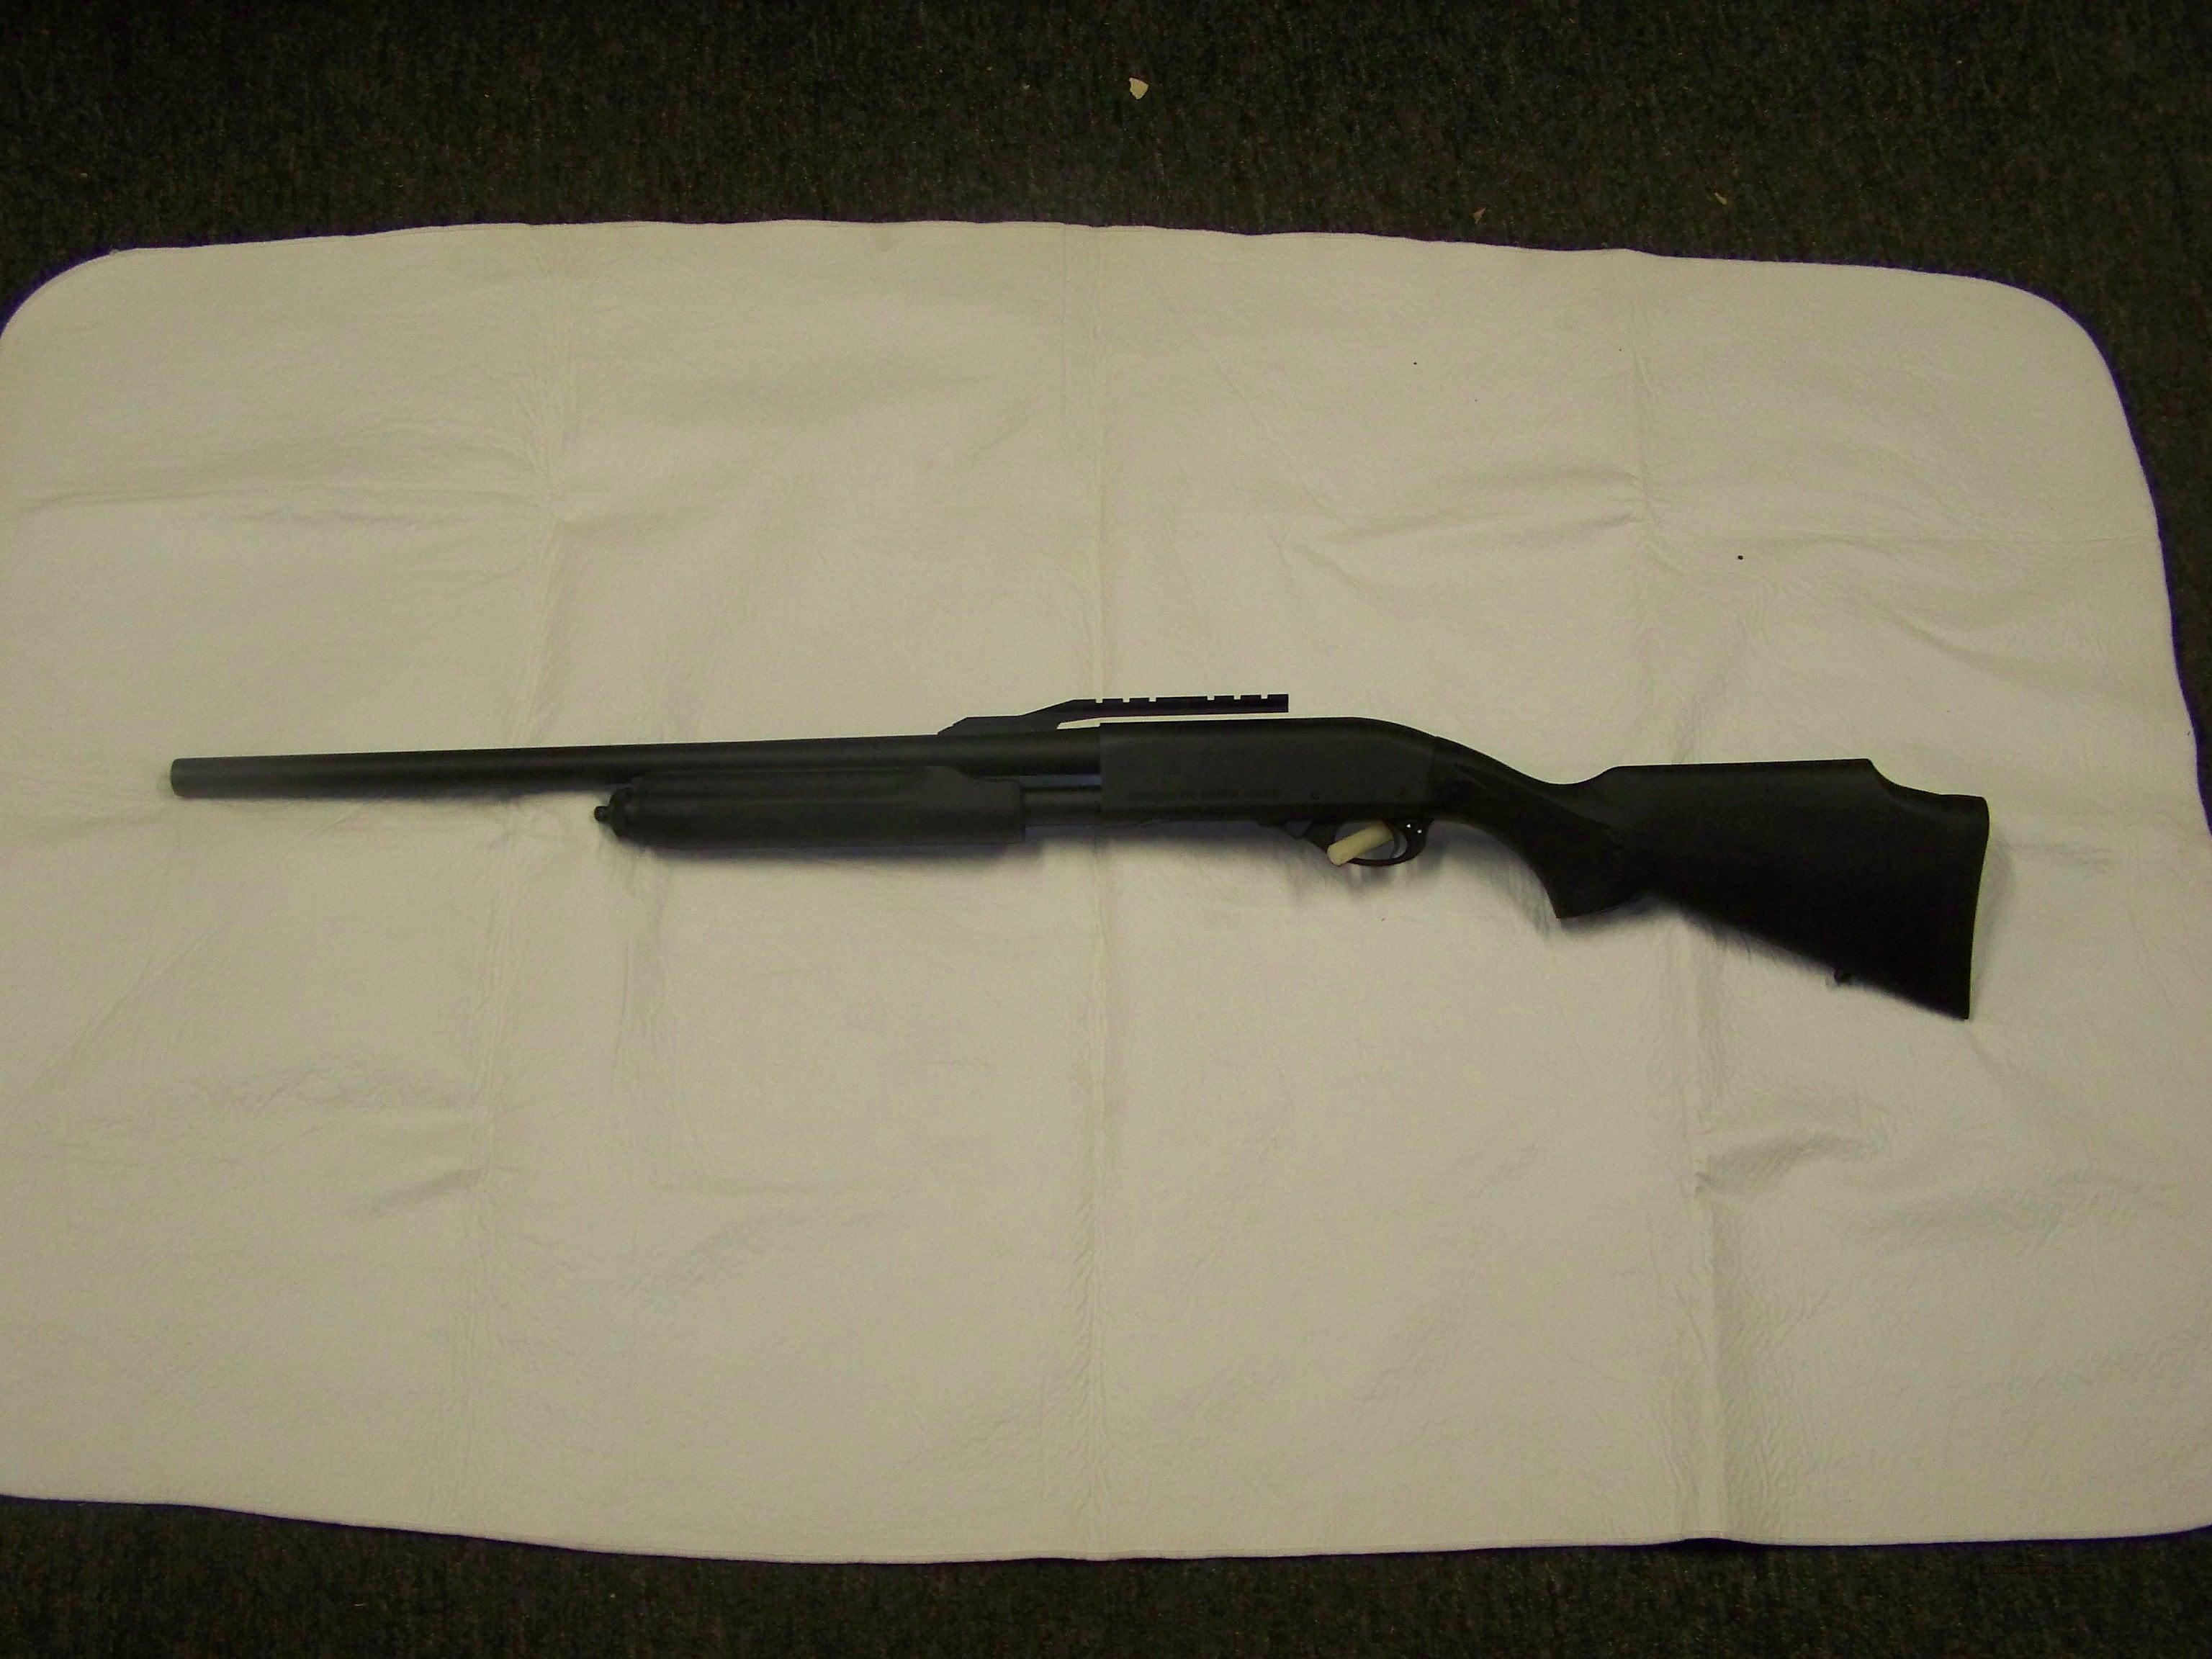 Remington 870 Express Deer Gun for sale